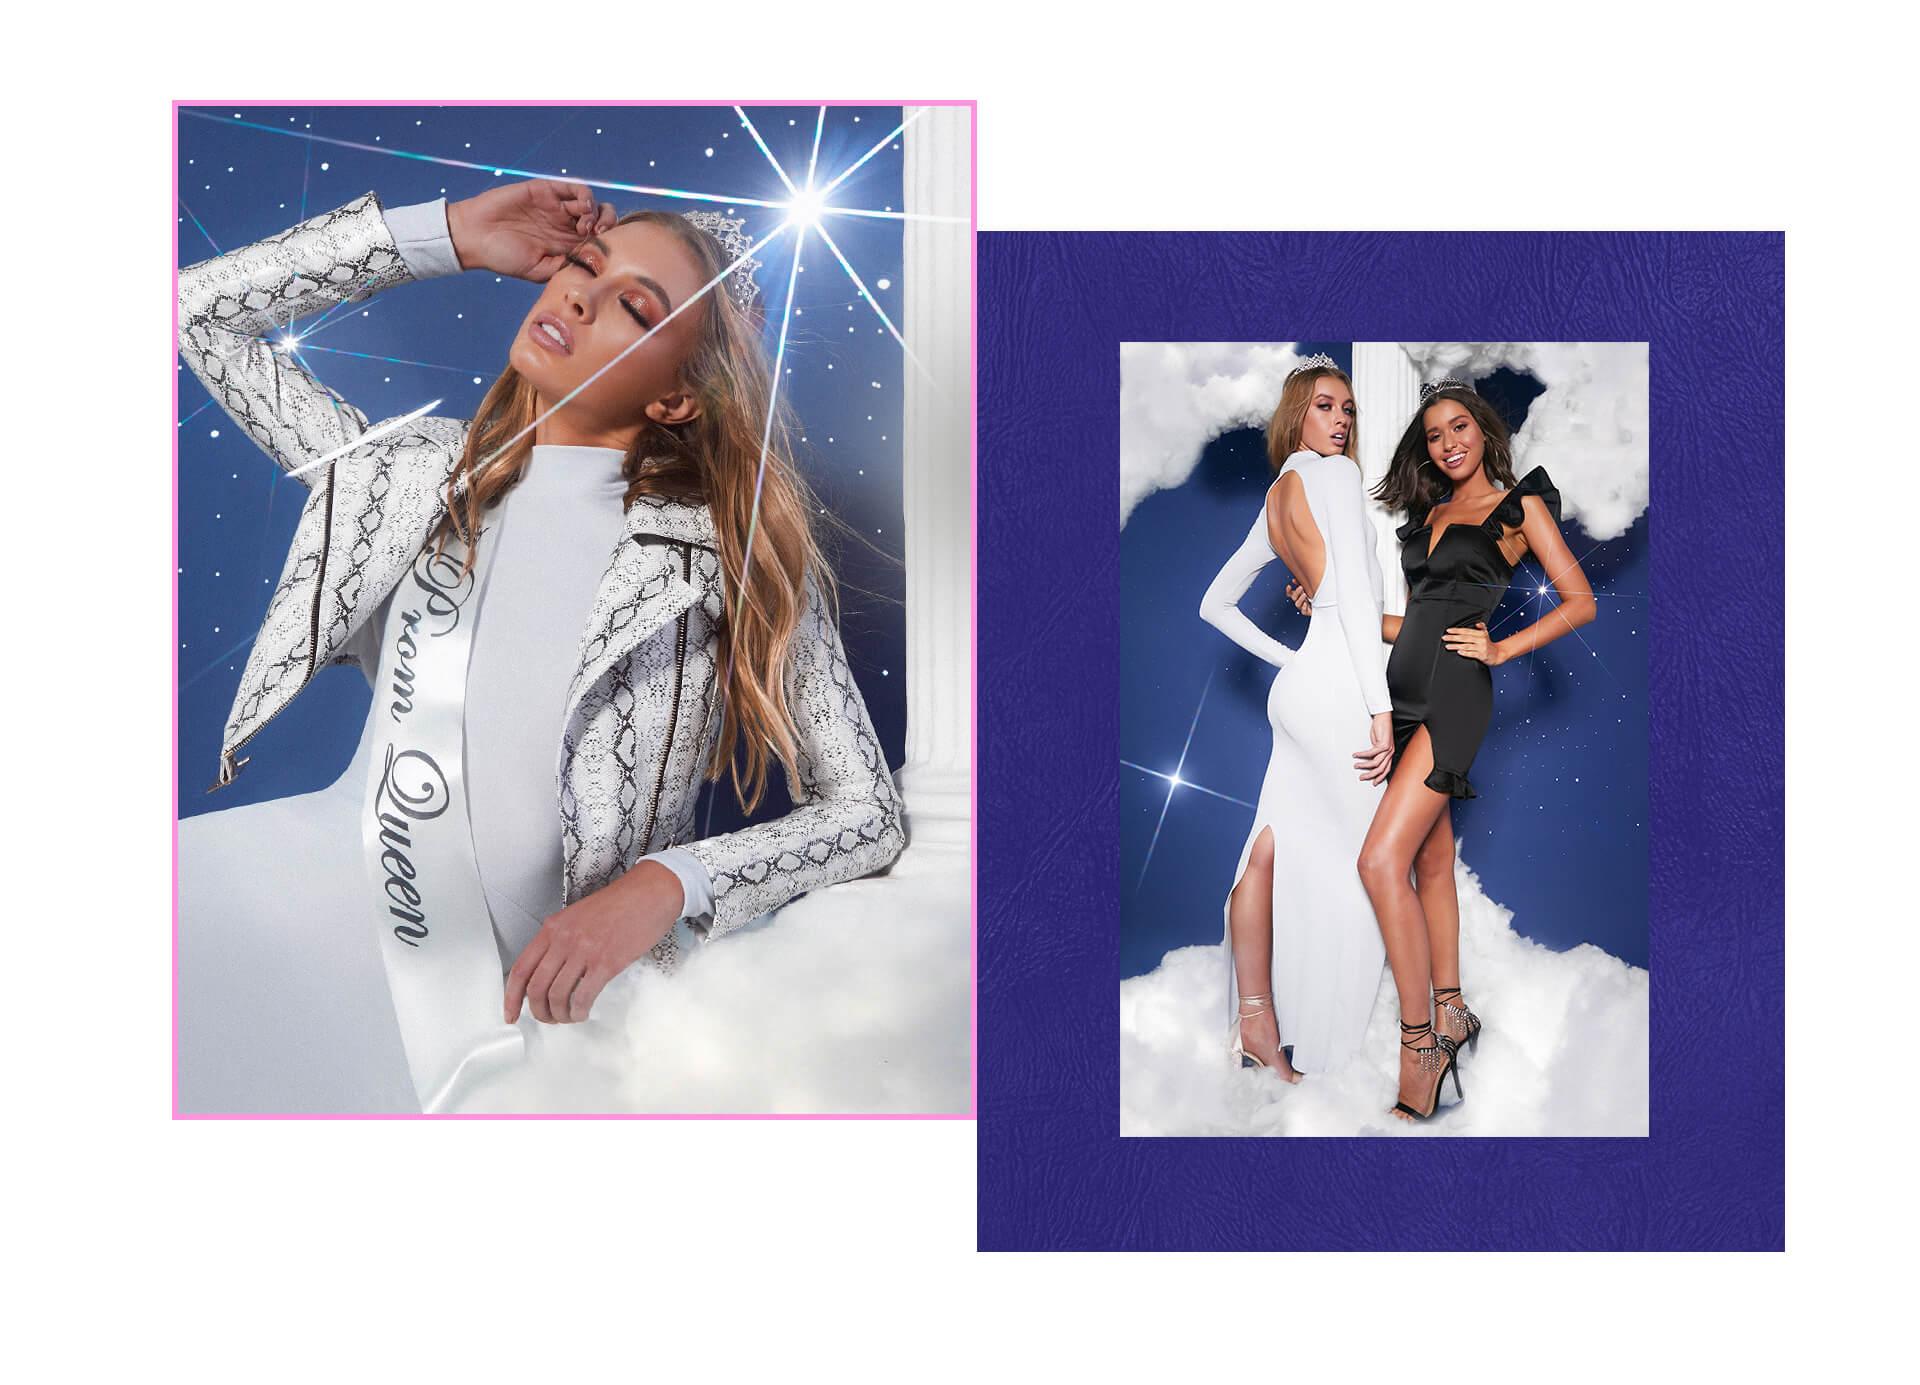 prom feature leopard print jacket, white midi dress and black bodycon dress lookbook image 1